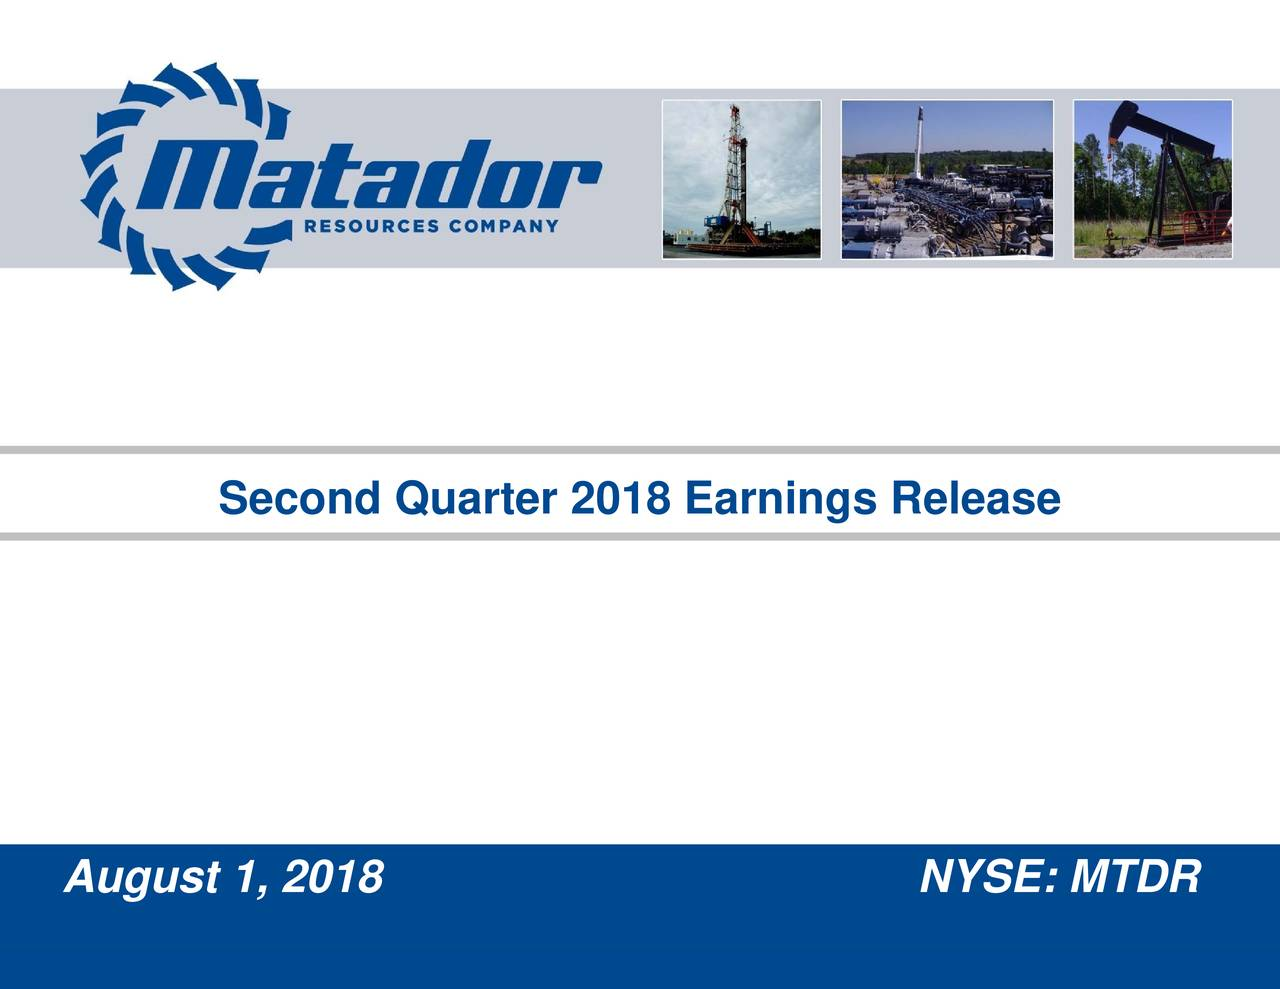 Second Quarter 2018 Earnings Release August 1, 2018